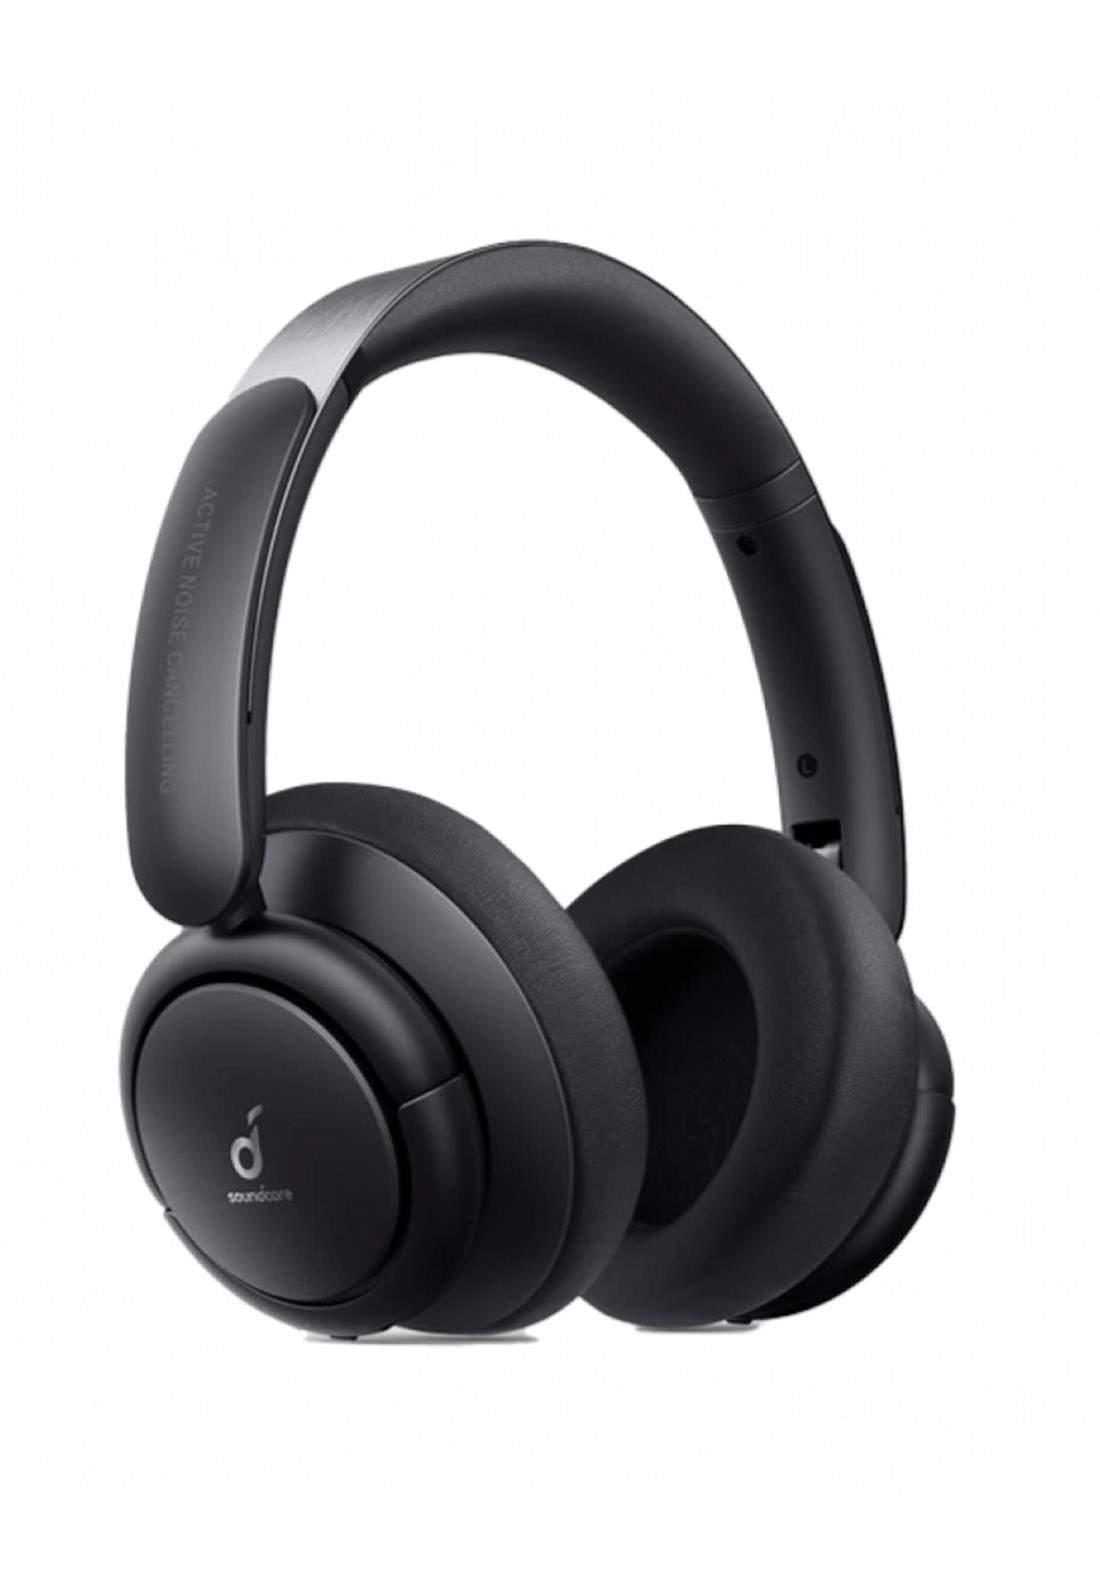 Anker A3029HA1 Wireless Headphones - Black سماعة لا سلكية